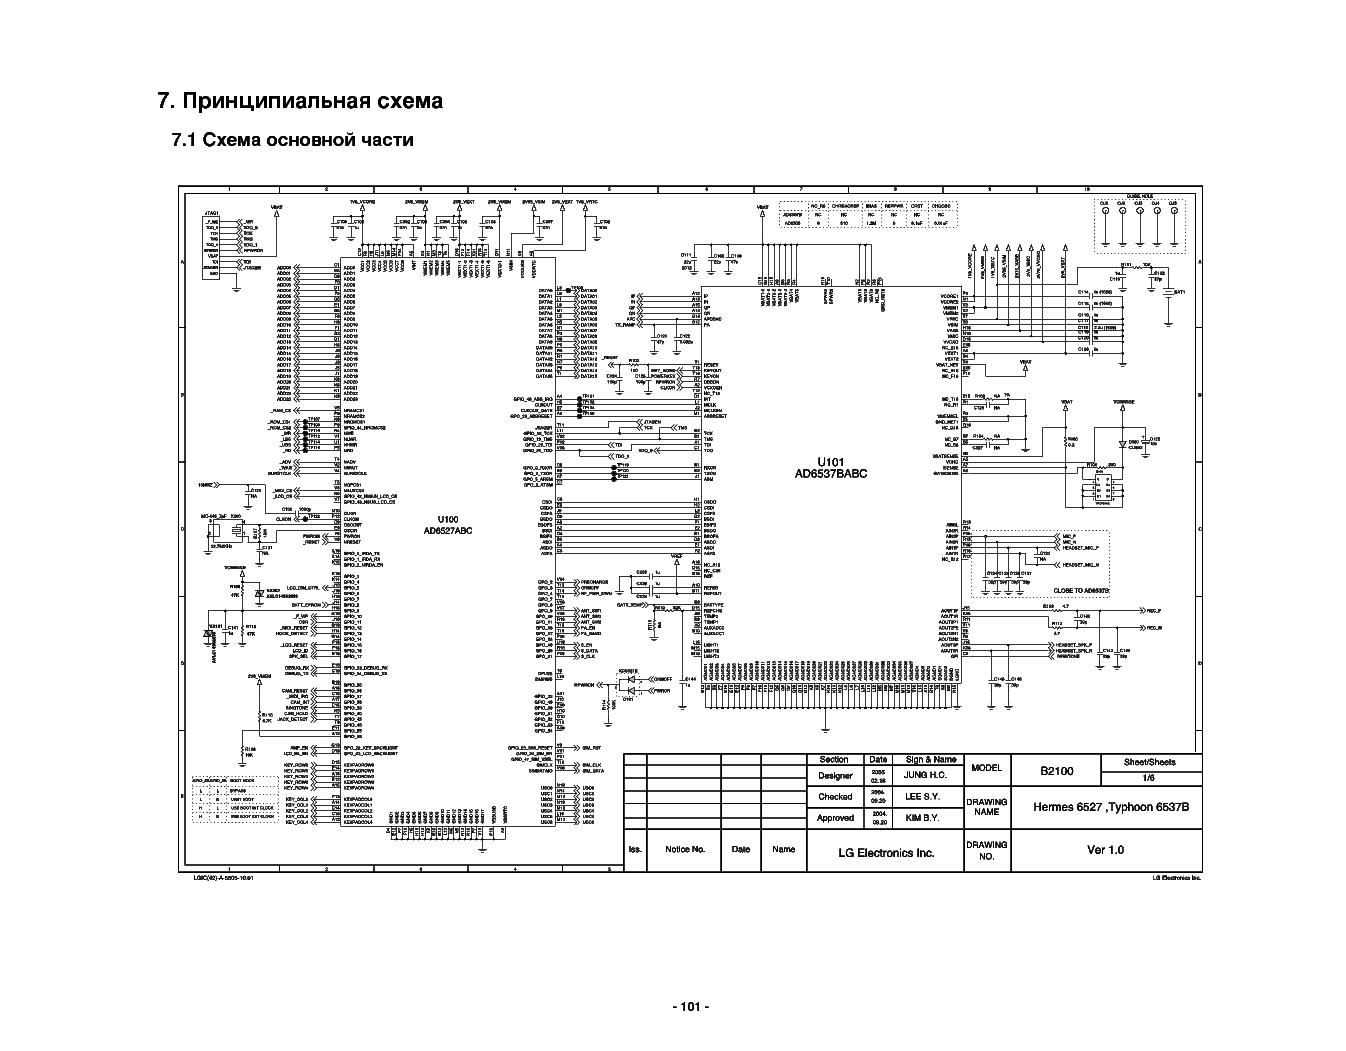 Diagram Huawei Gr3 Diagram - Wiring Diagram Schematic Circuit